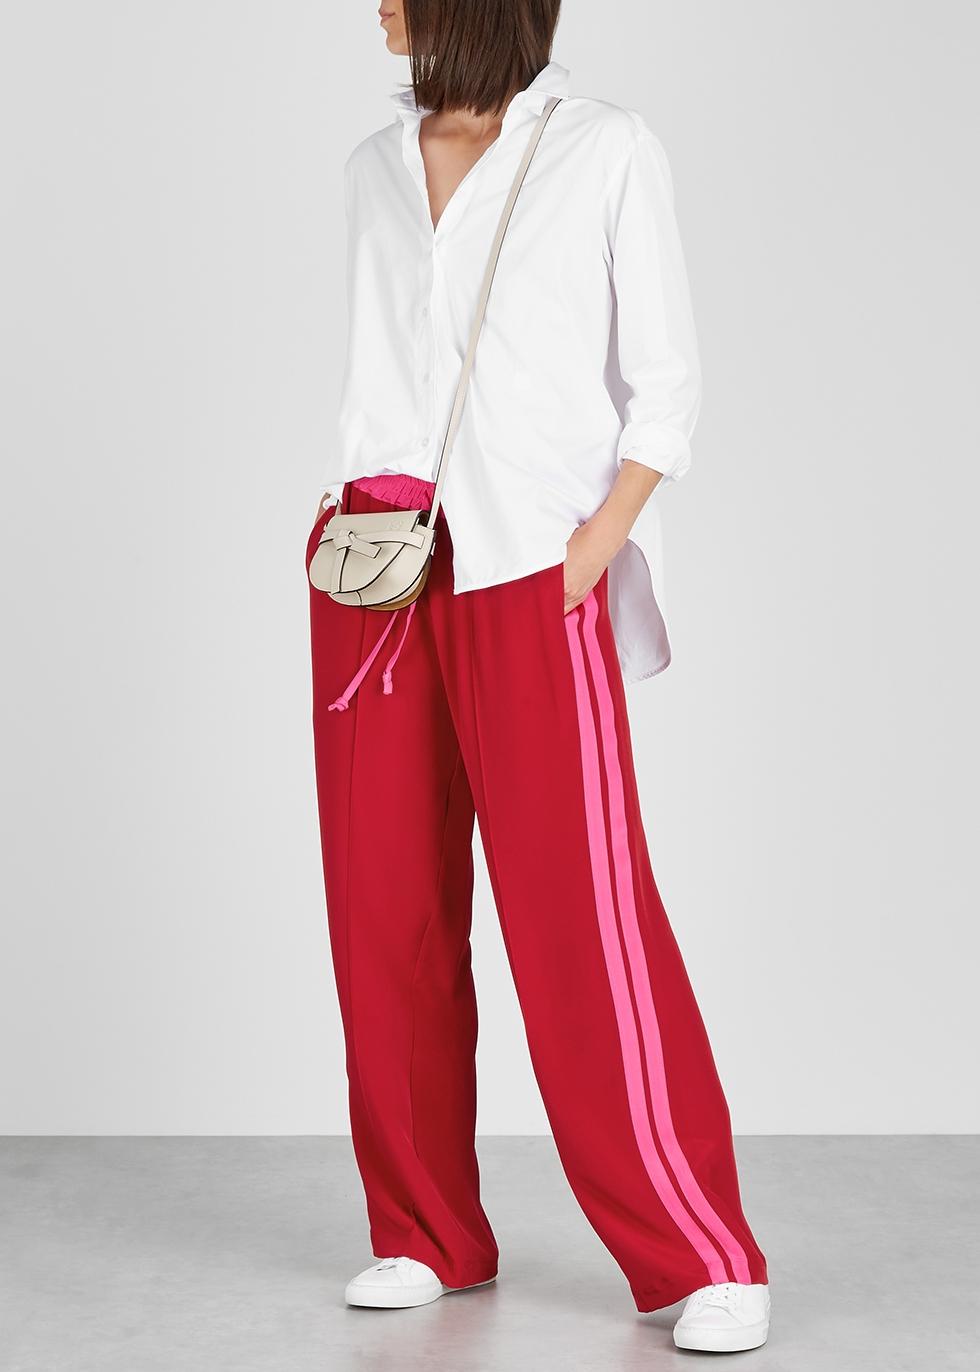 37bd36d375f8 Women's Designer Clothing, Shoes and Bags - Harvey Nichols